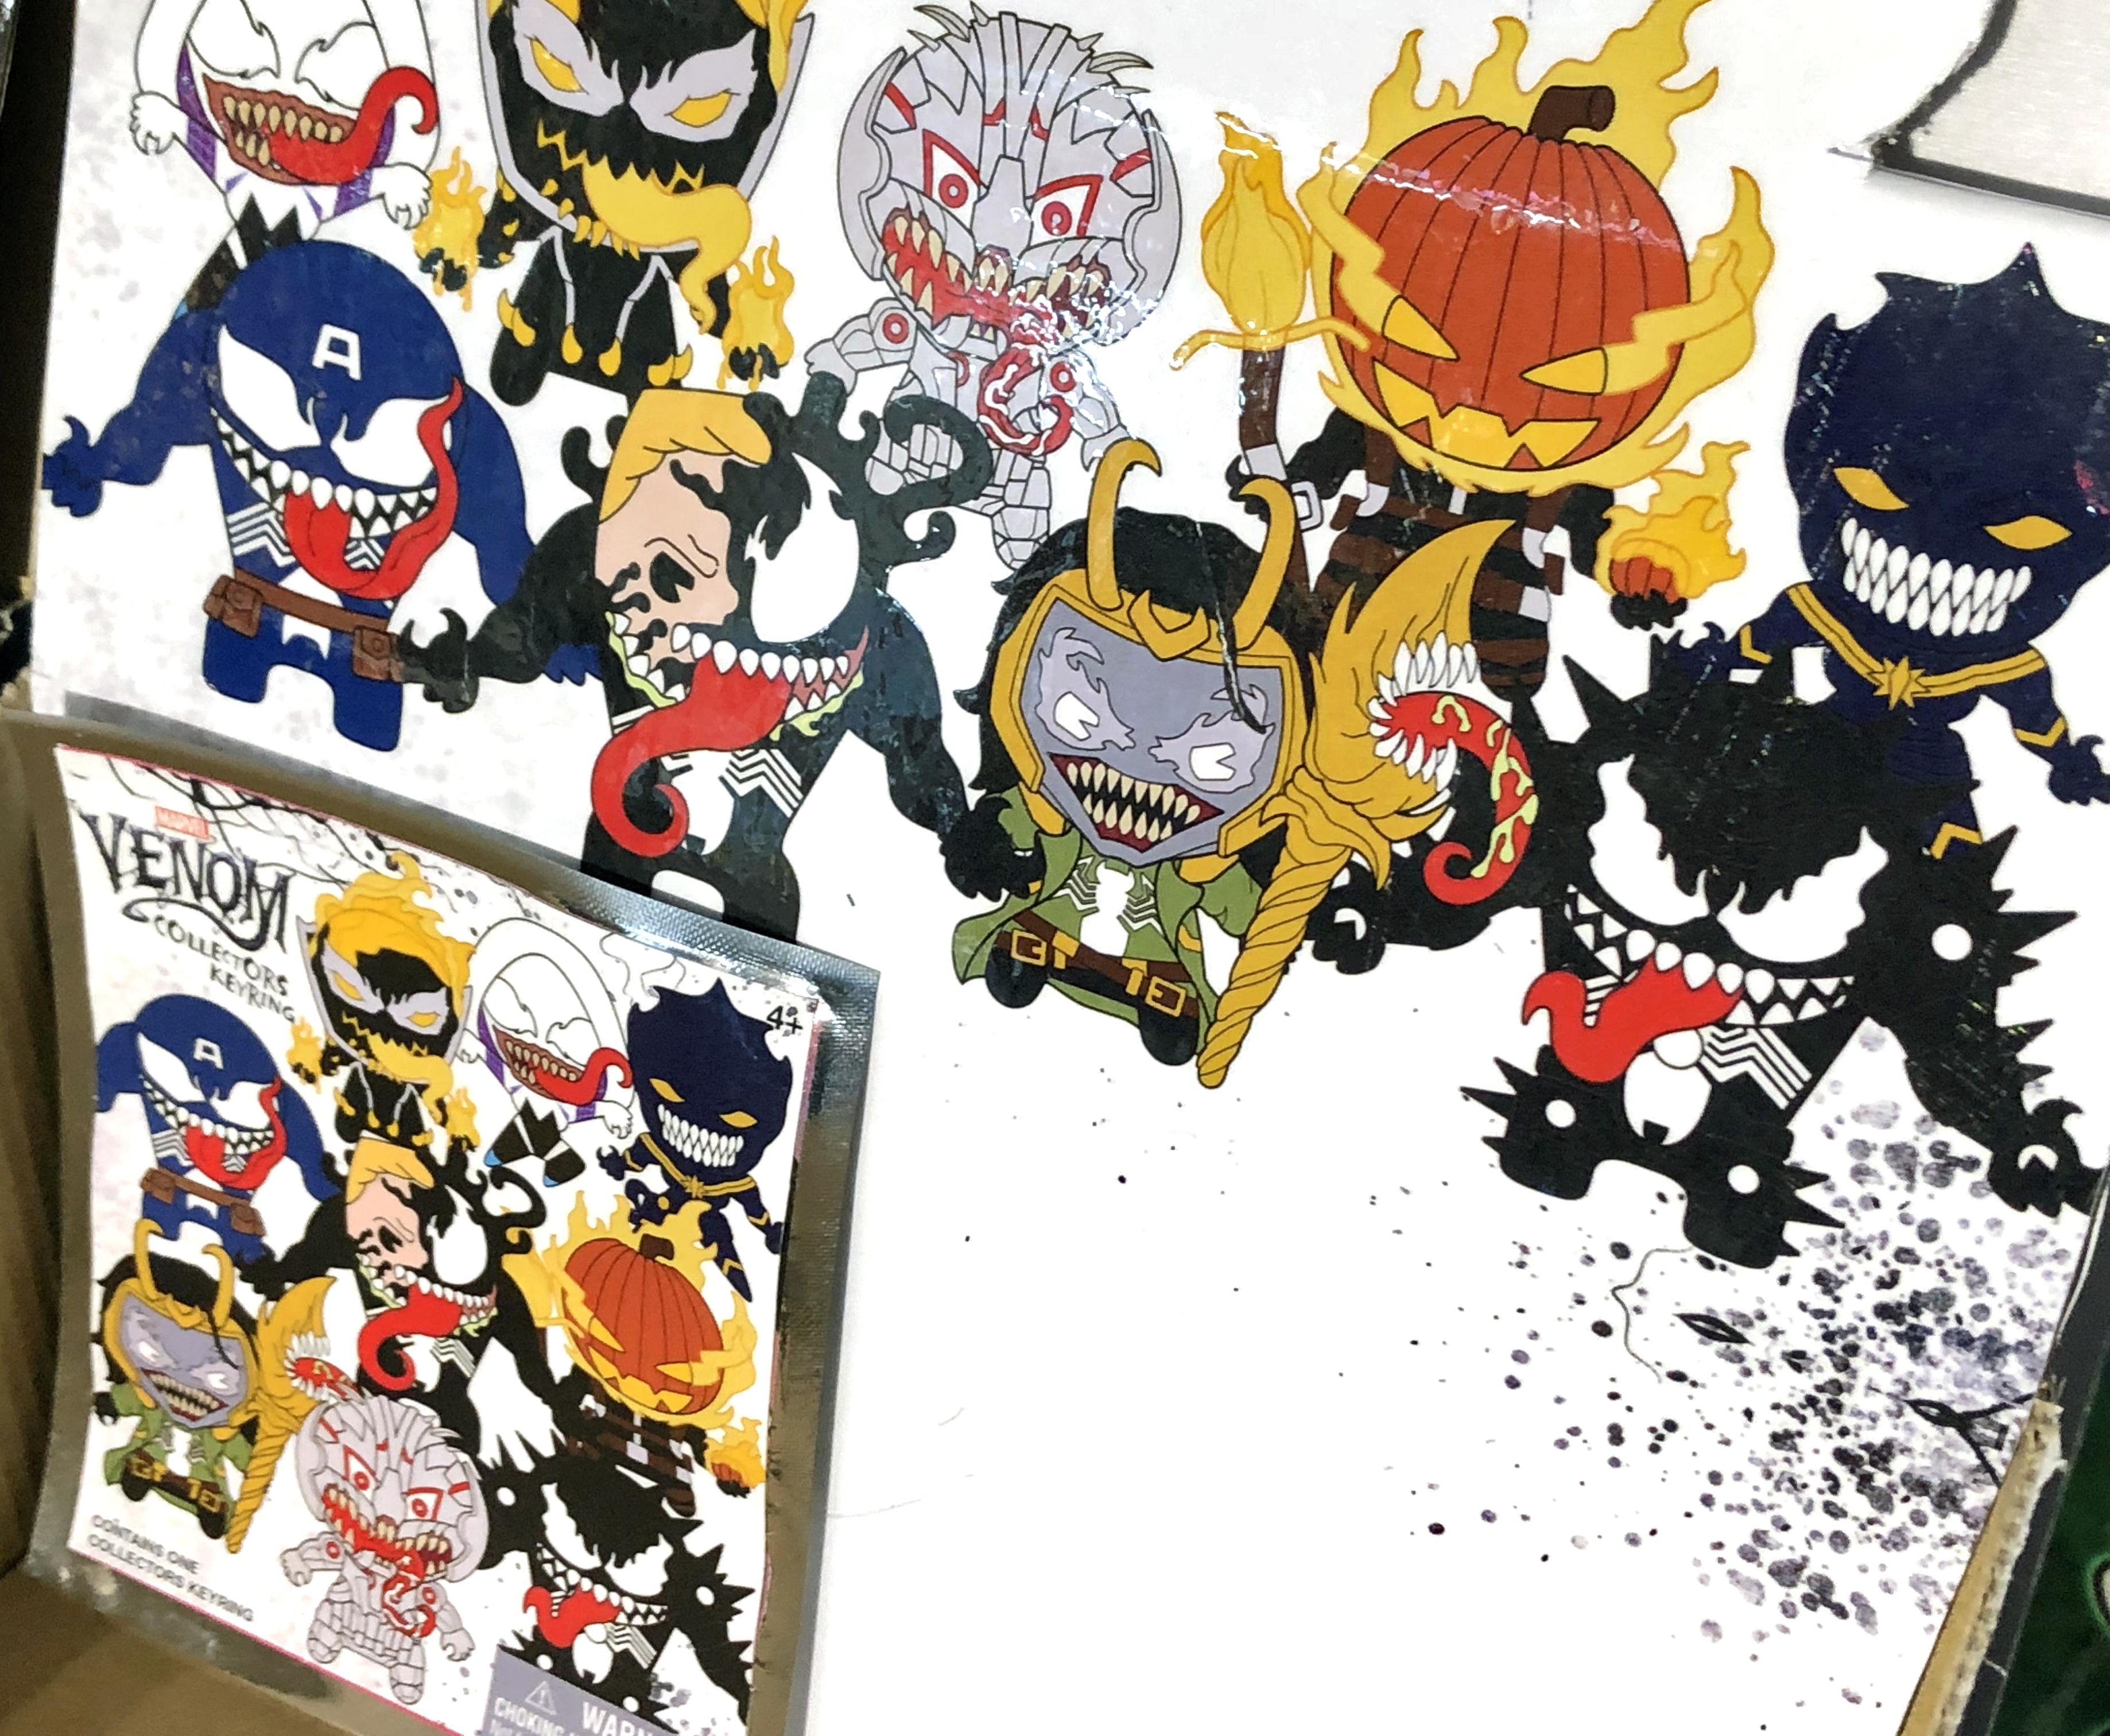 2018 Toy Fair Monogram International Venom Collectors Keyrings 02